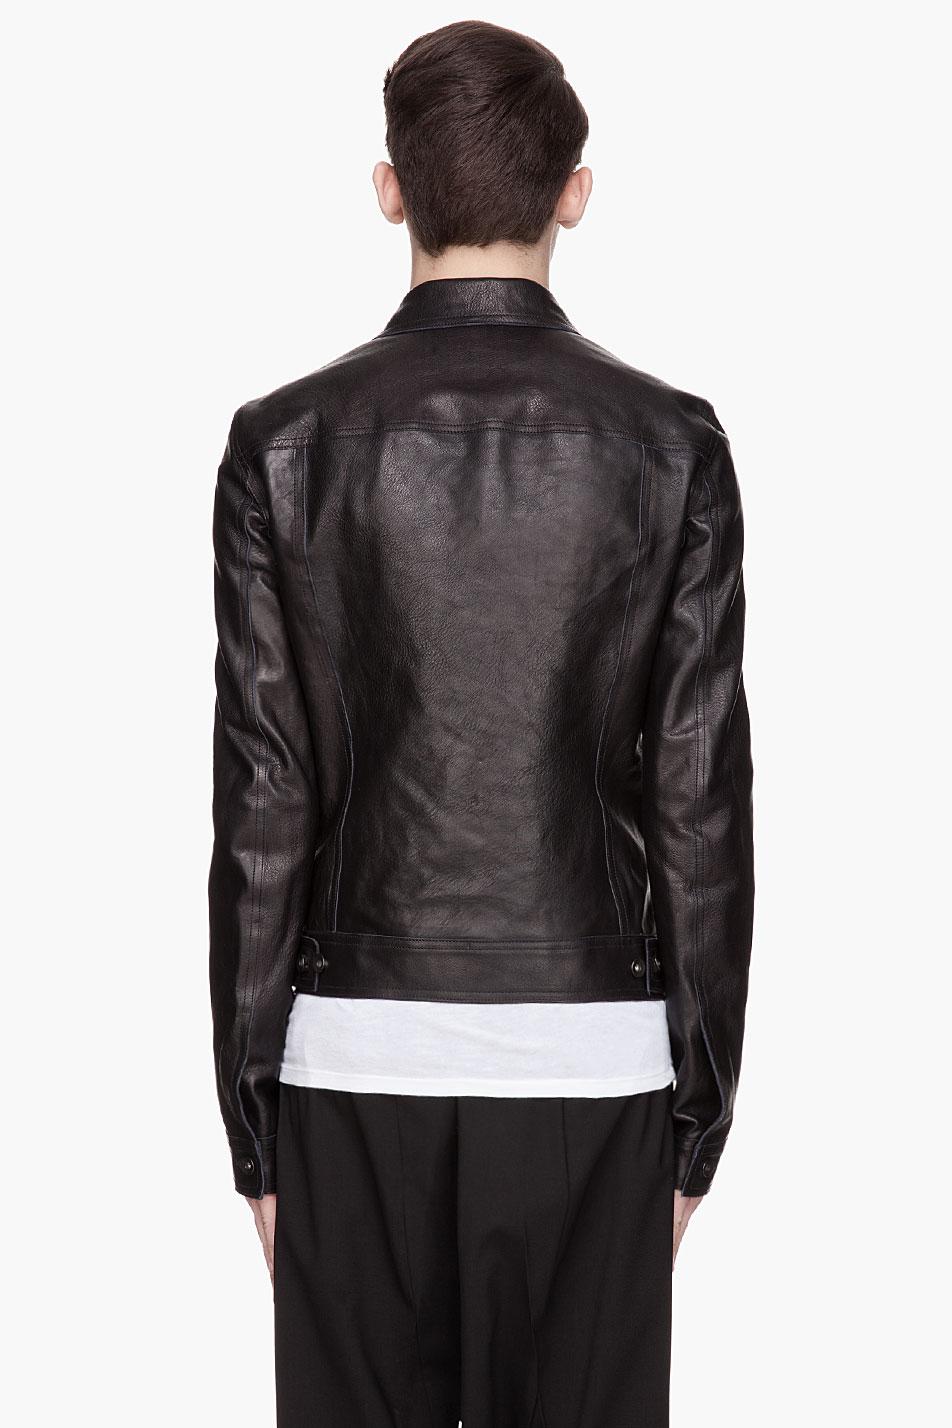 Heavy leather jackets